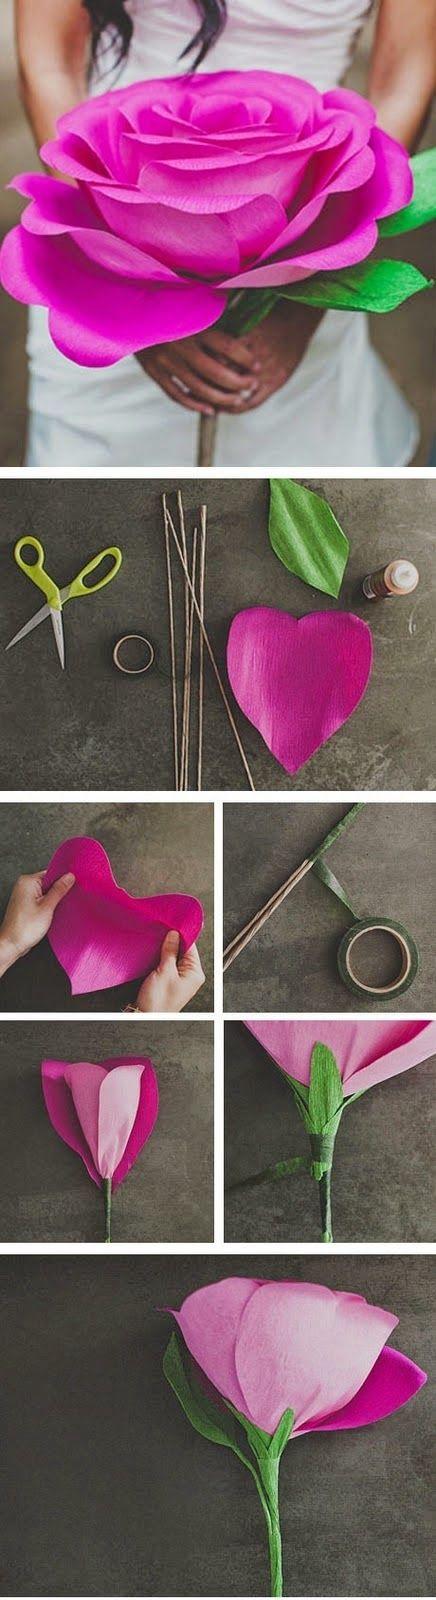 ARTESANATO COM QUIANE - Paps,Moldes,E.V.A,Feltro,Costuras,Fofuchas 3D: Flowers and Florals